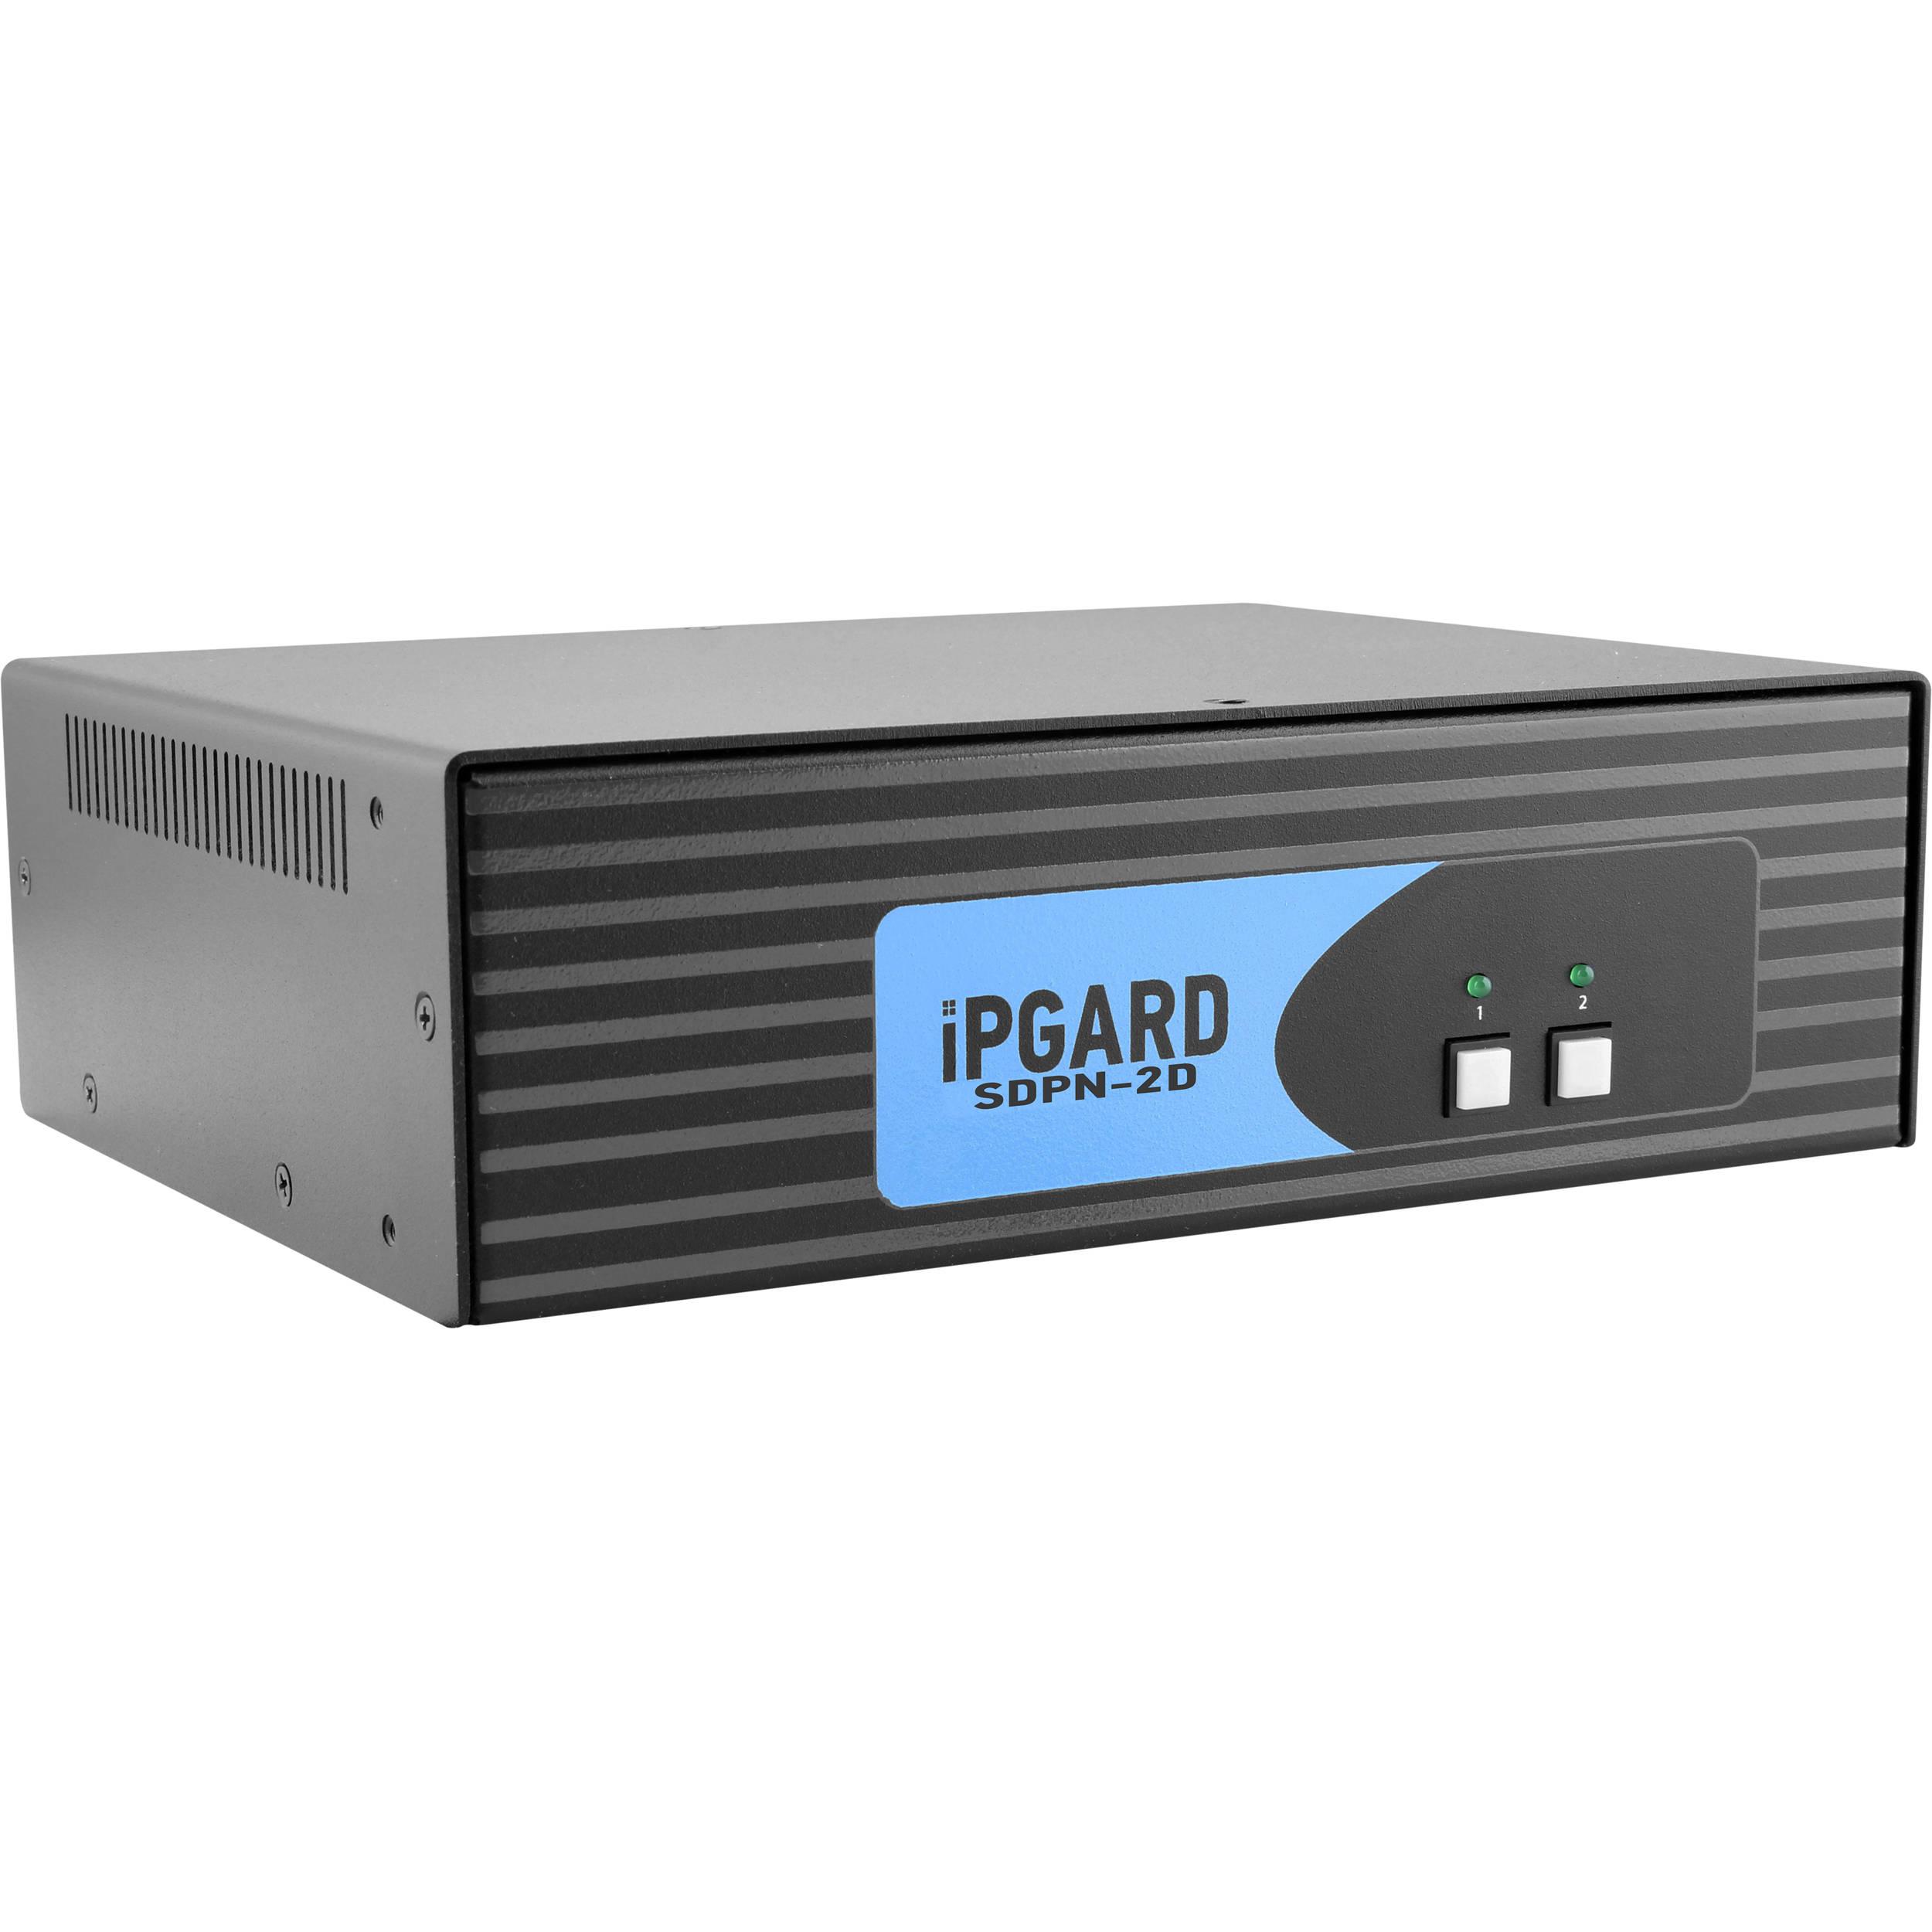 IPGard SDPN 2D 2 Port Dual Head 4K DisplayPort KVM Switch